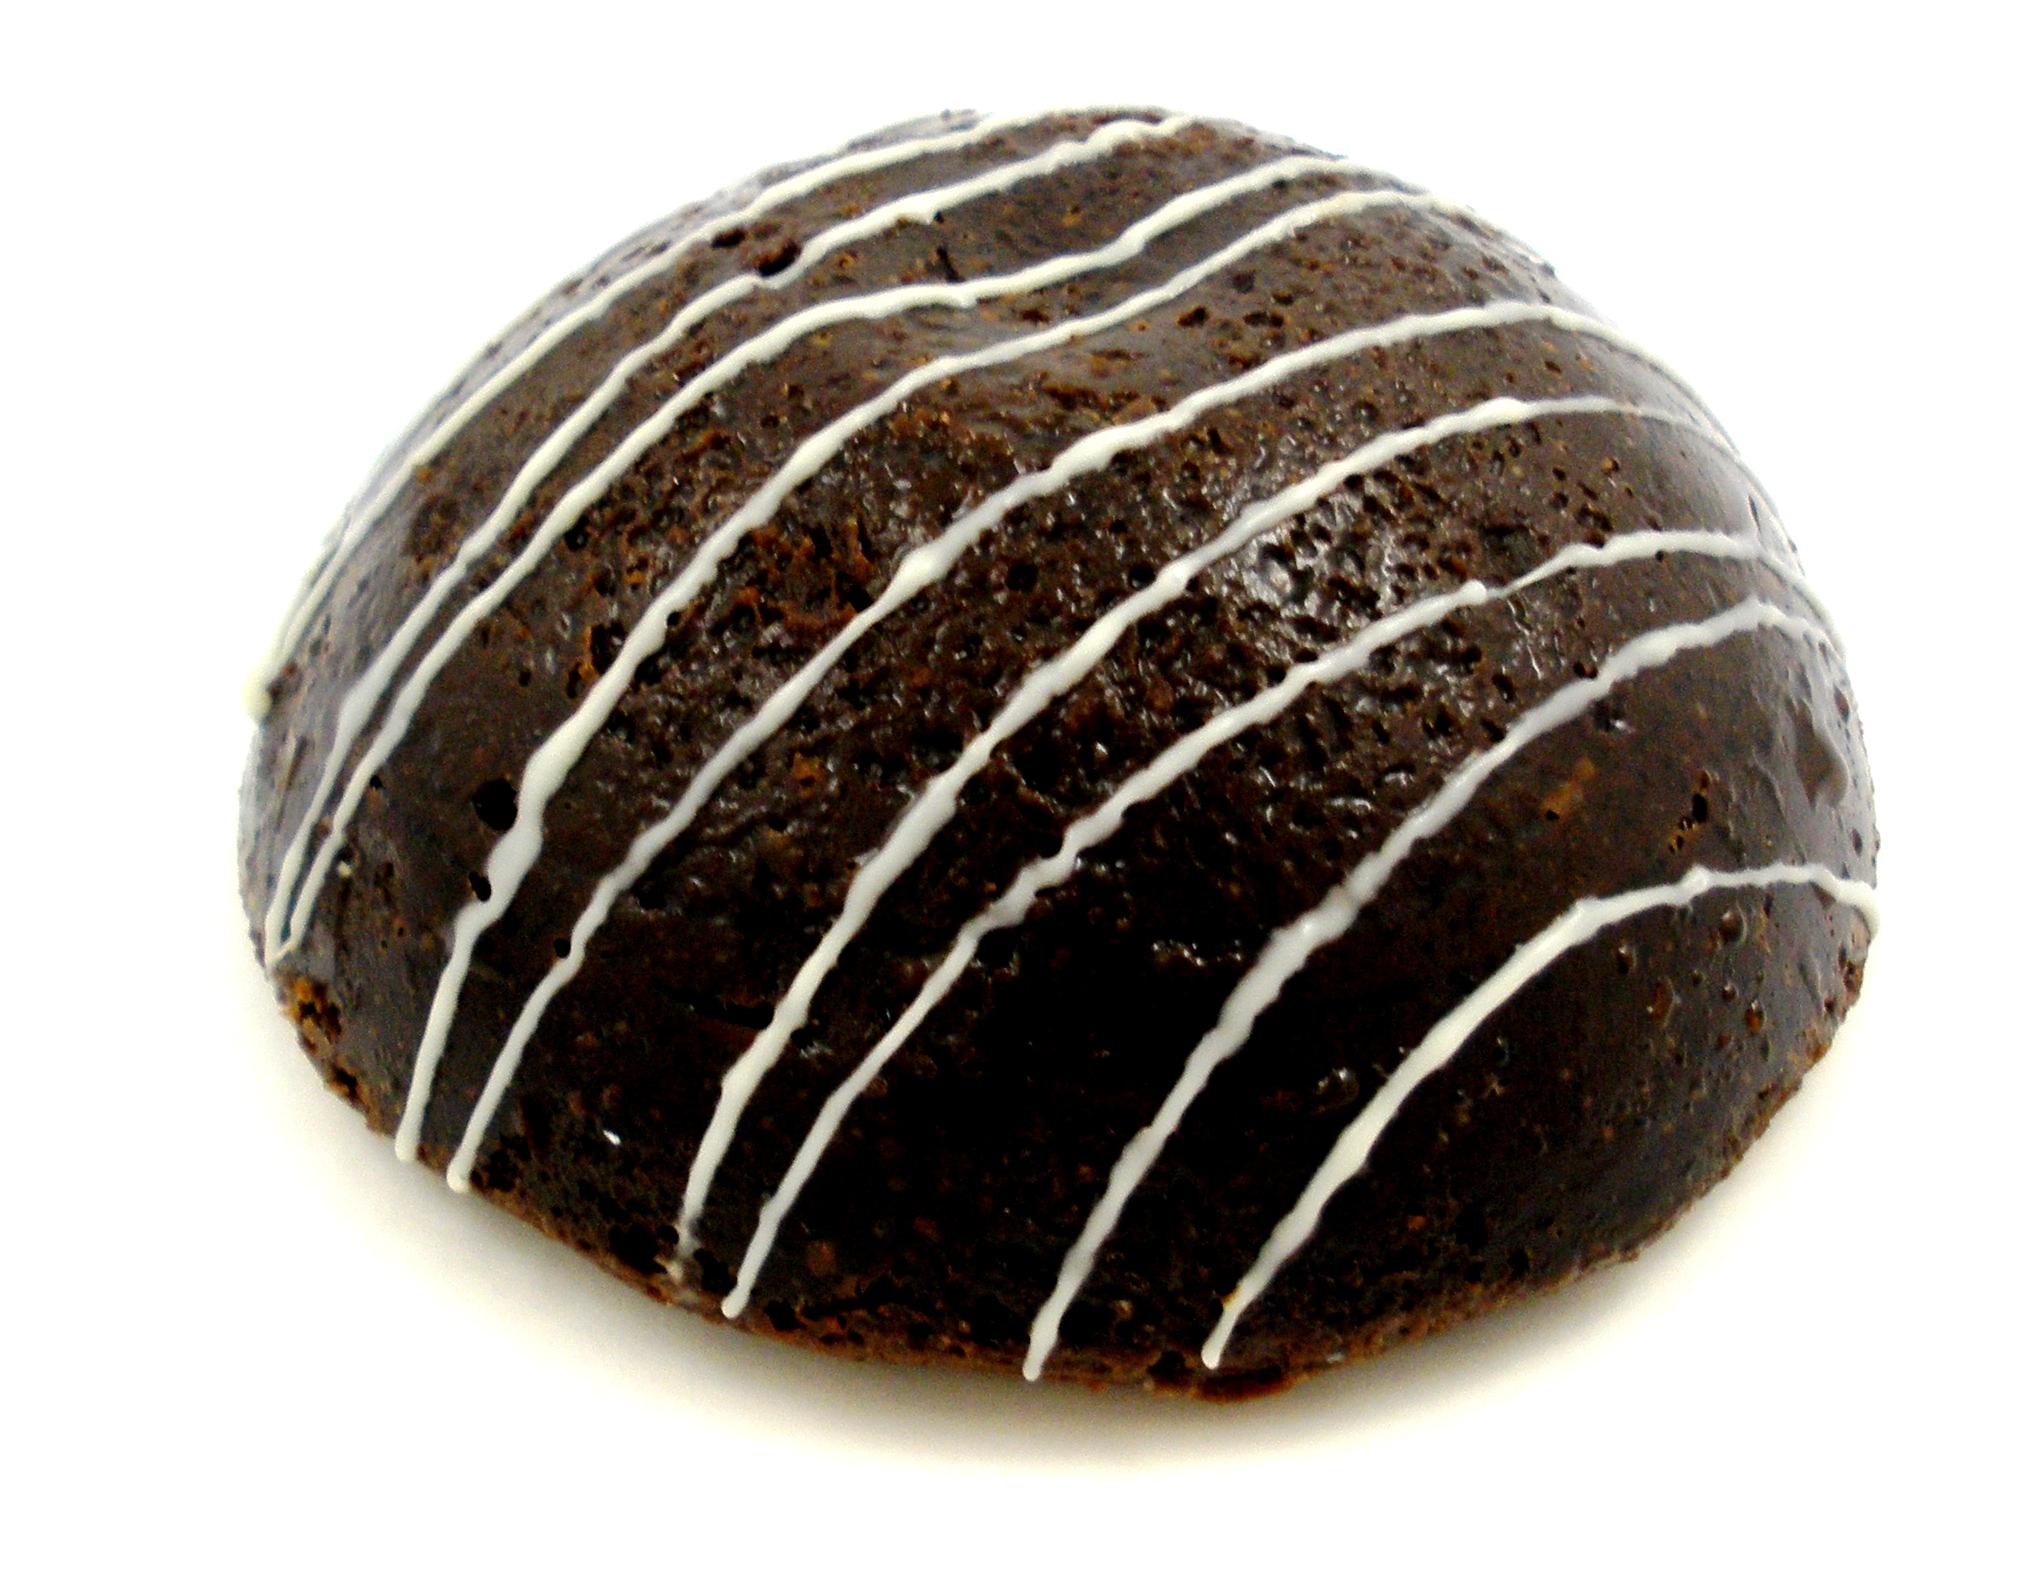 https://0901.nccdn.net/4_2/000/000/078/264/Gluten-Free-ind-caramel-bombe.JPG